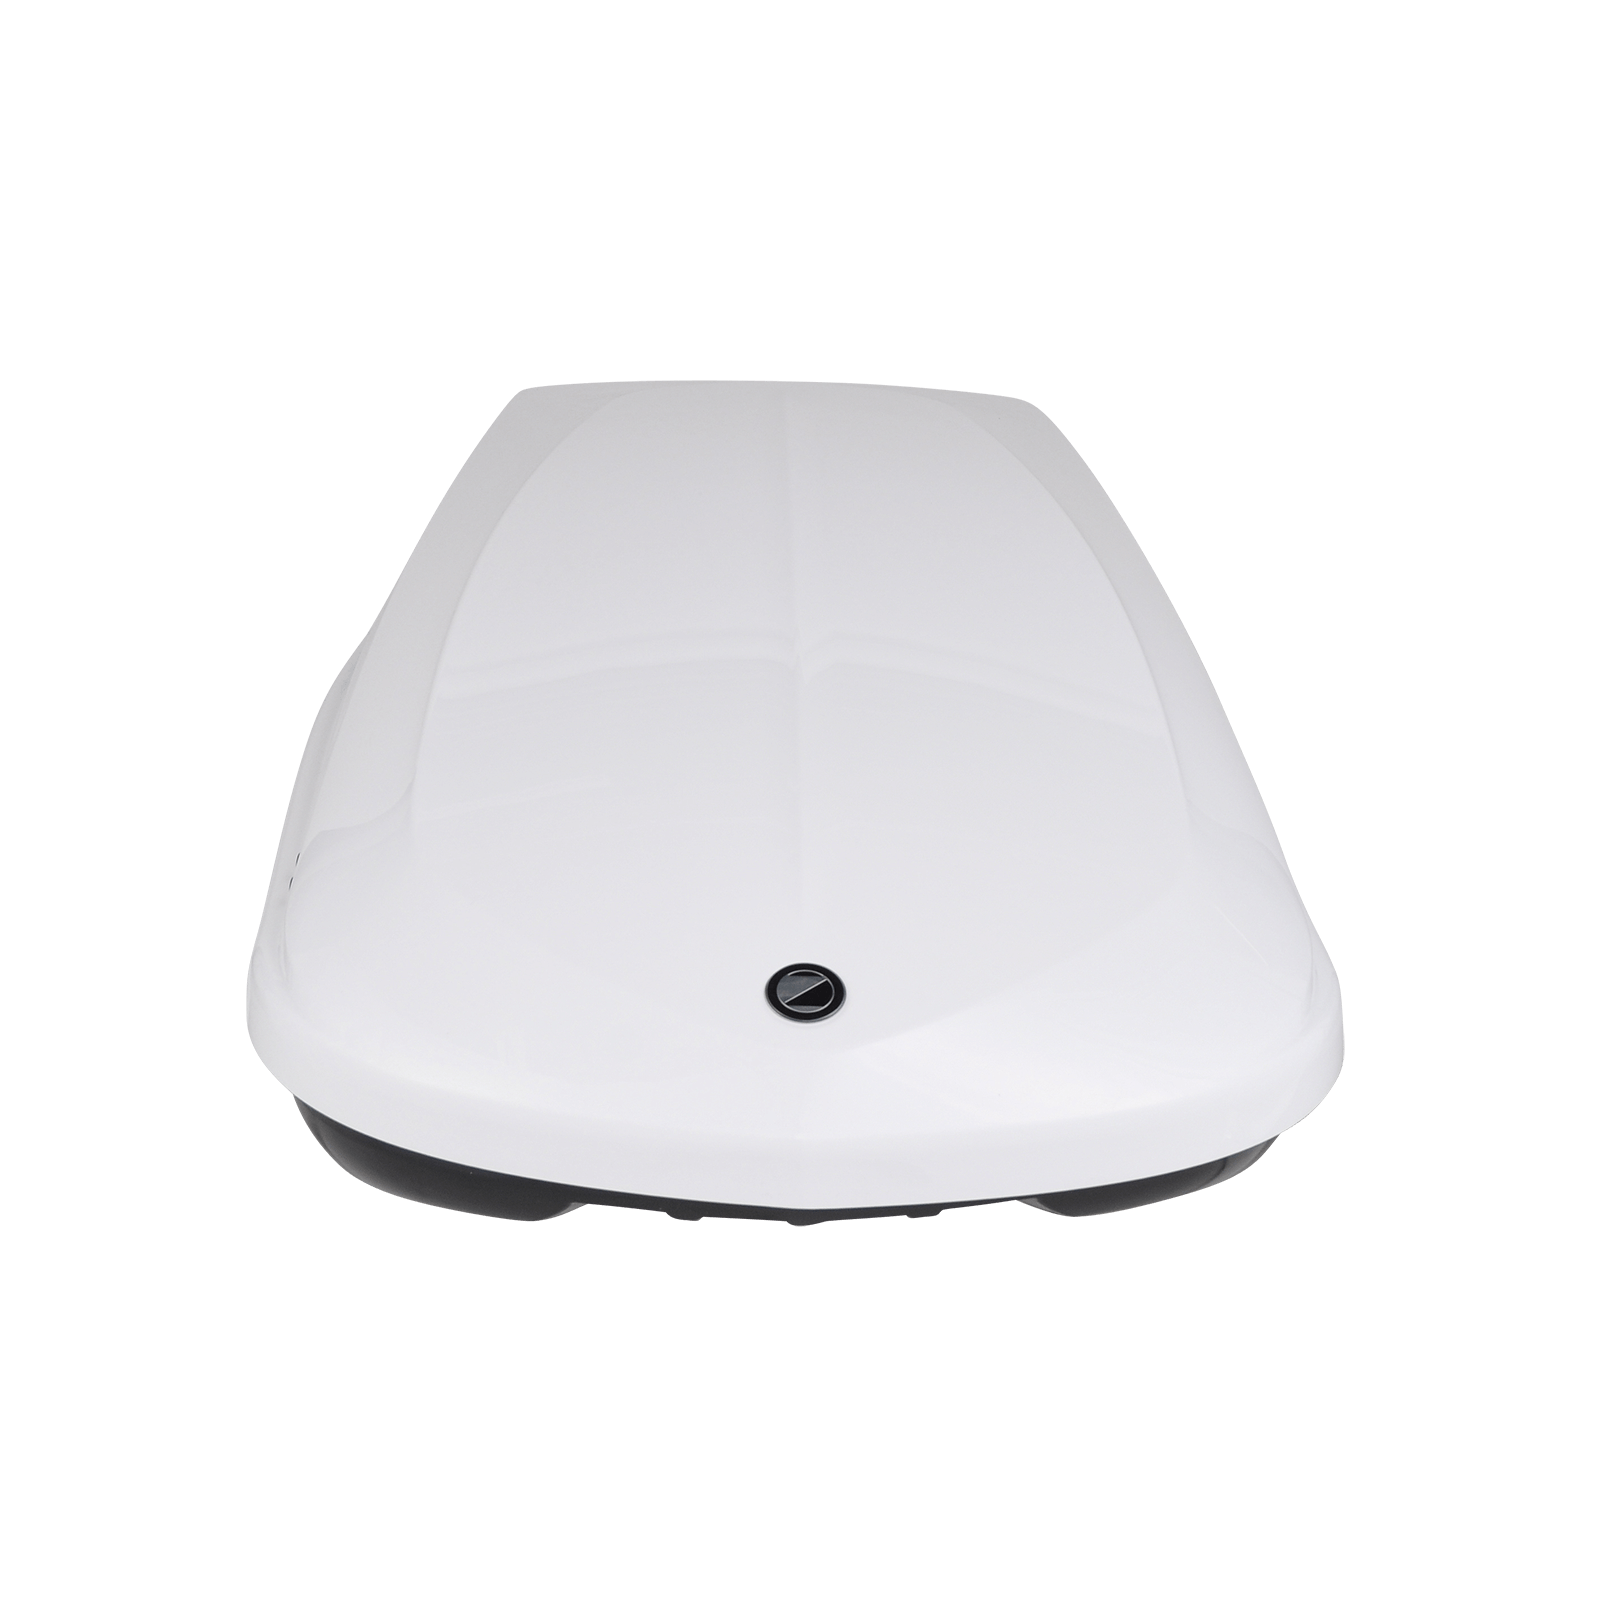 Dachbox Hapro Zenith 6.6 PureWhite - Bild 3